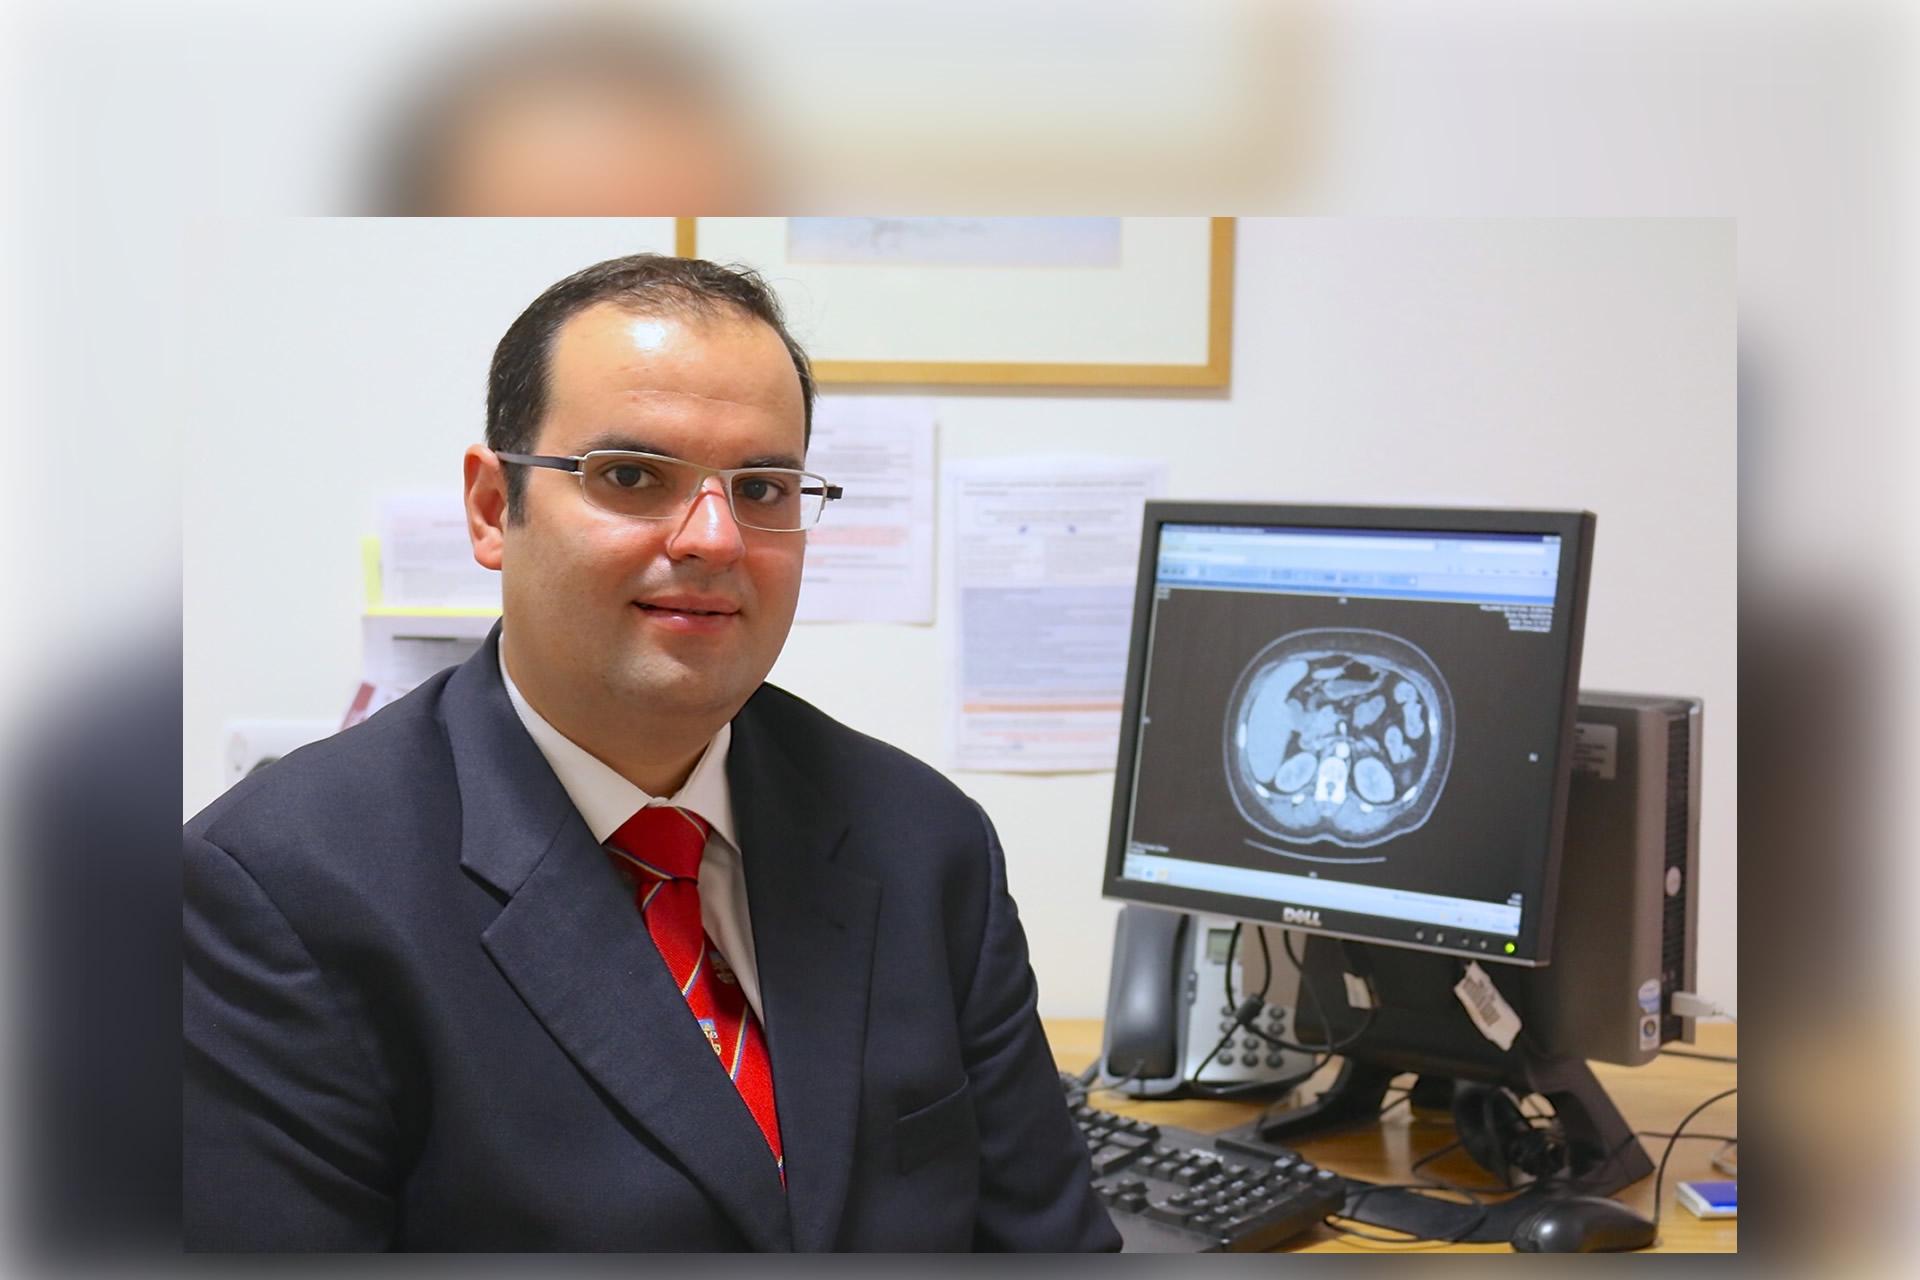 Dr. George Kalogeropoulos